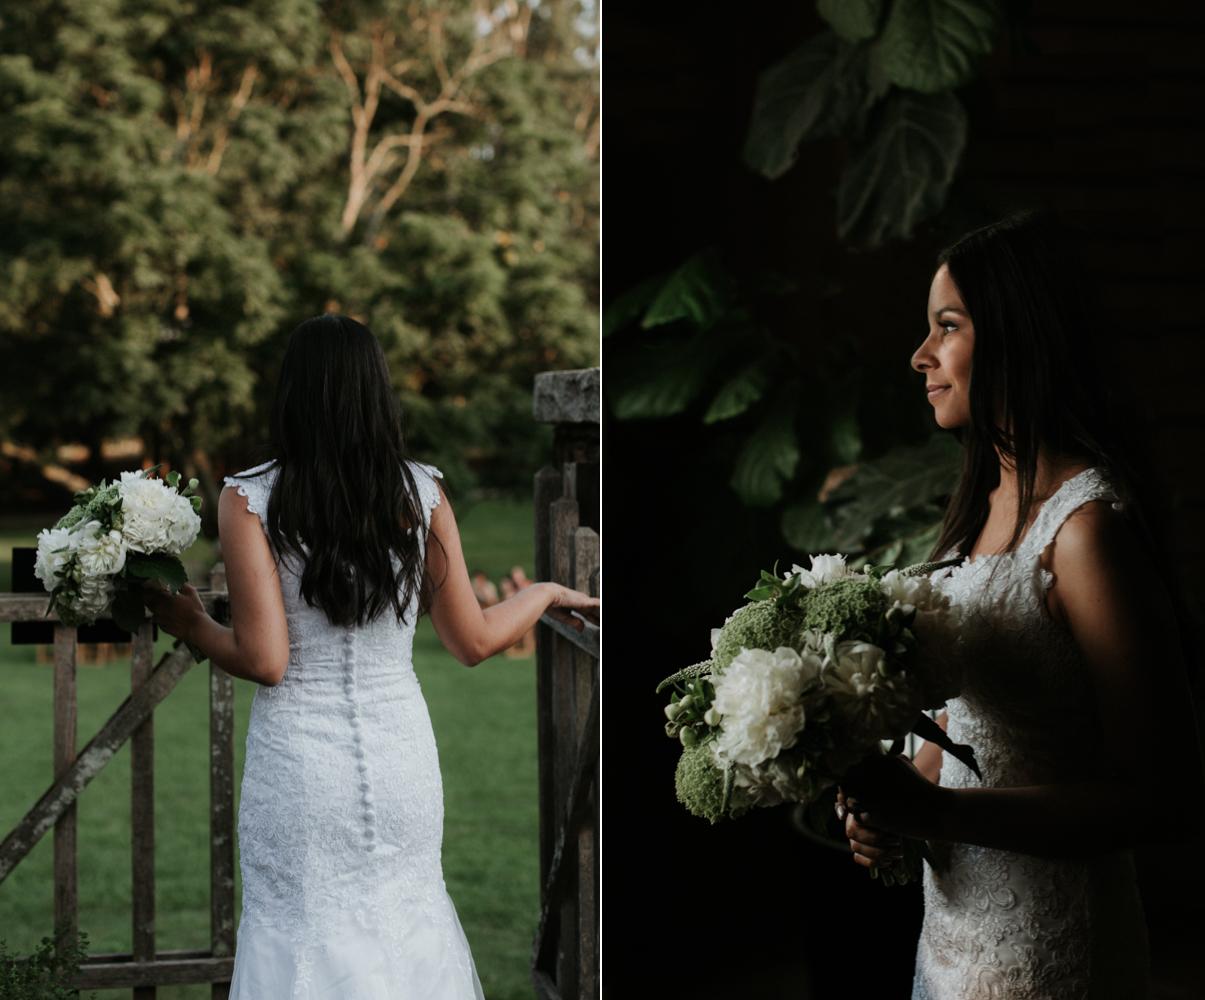 Atlanta_wedding_photographer_Inn_at_Serembe_intimate_elopement_sunset_artistic_photography_Gabriela_and_Felipe_doble9.jpg